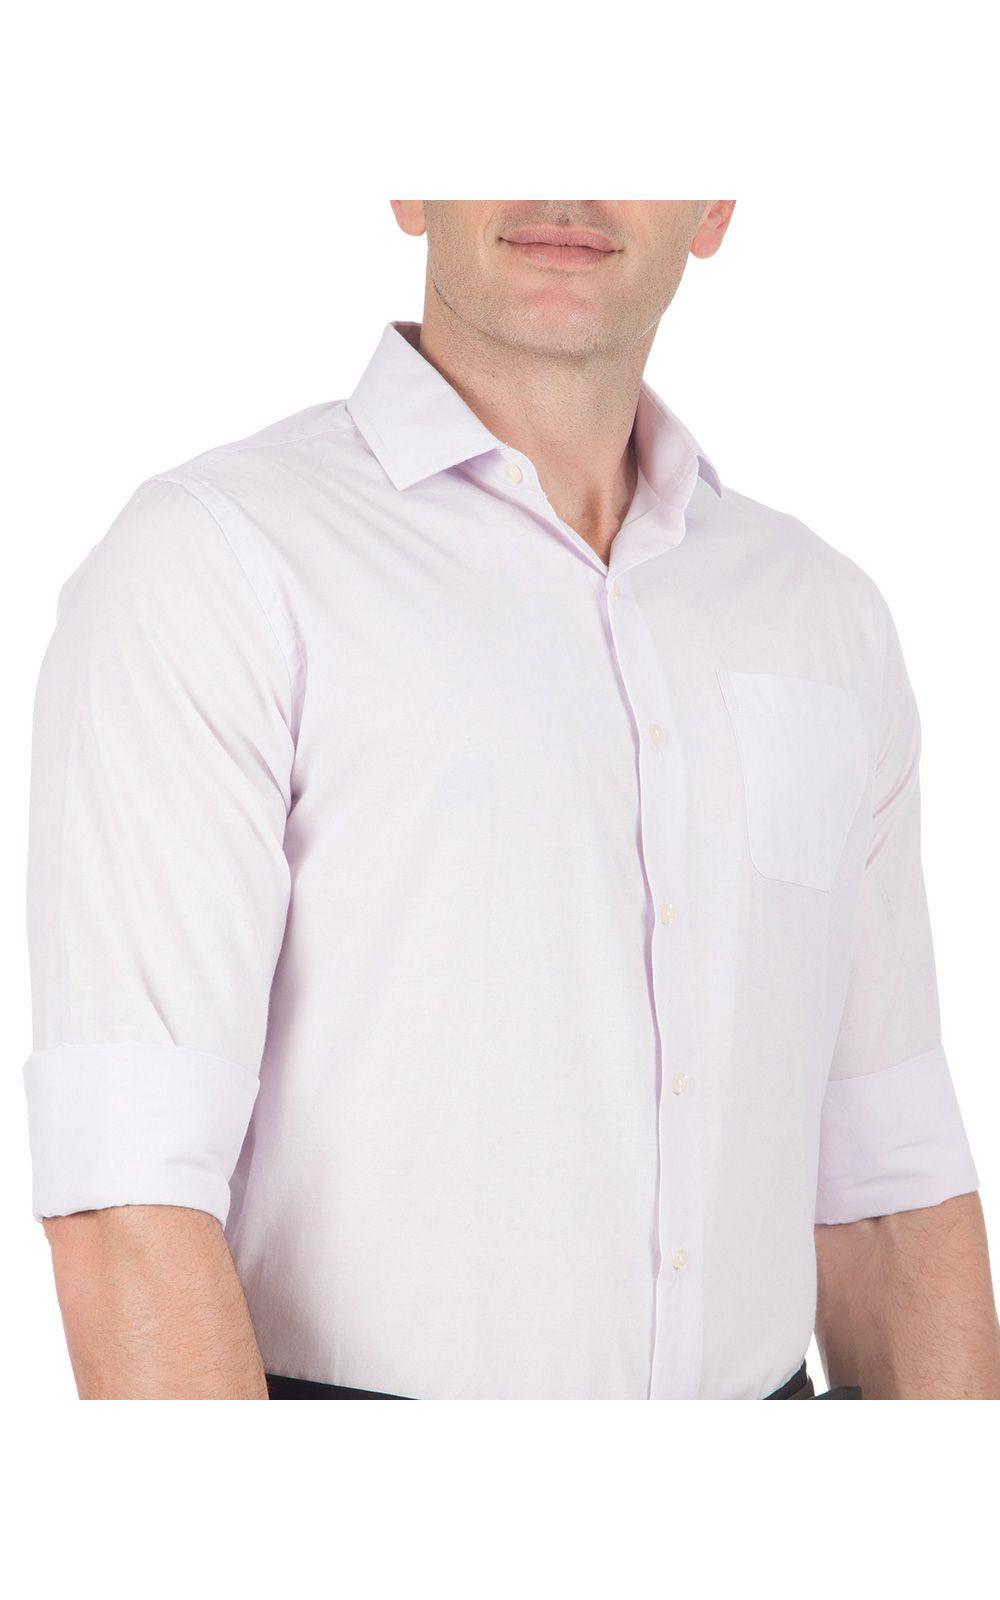 Foto 3 - Camisa Social Masculina Lilás Lisa